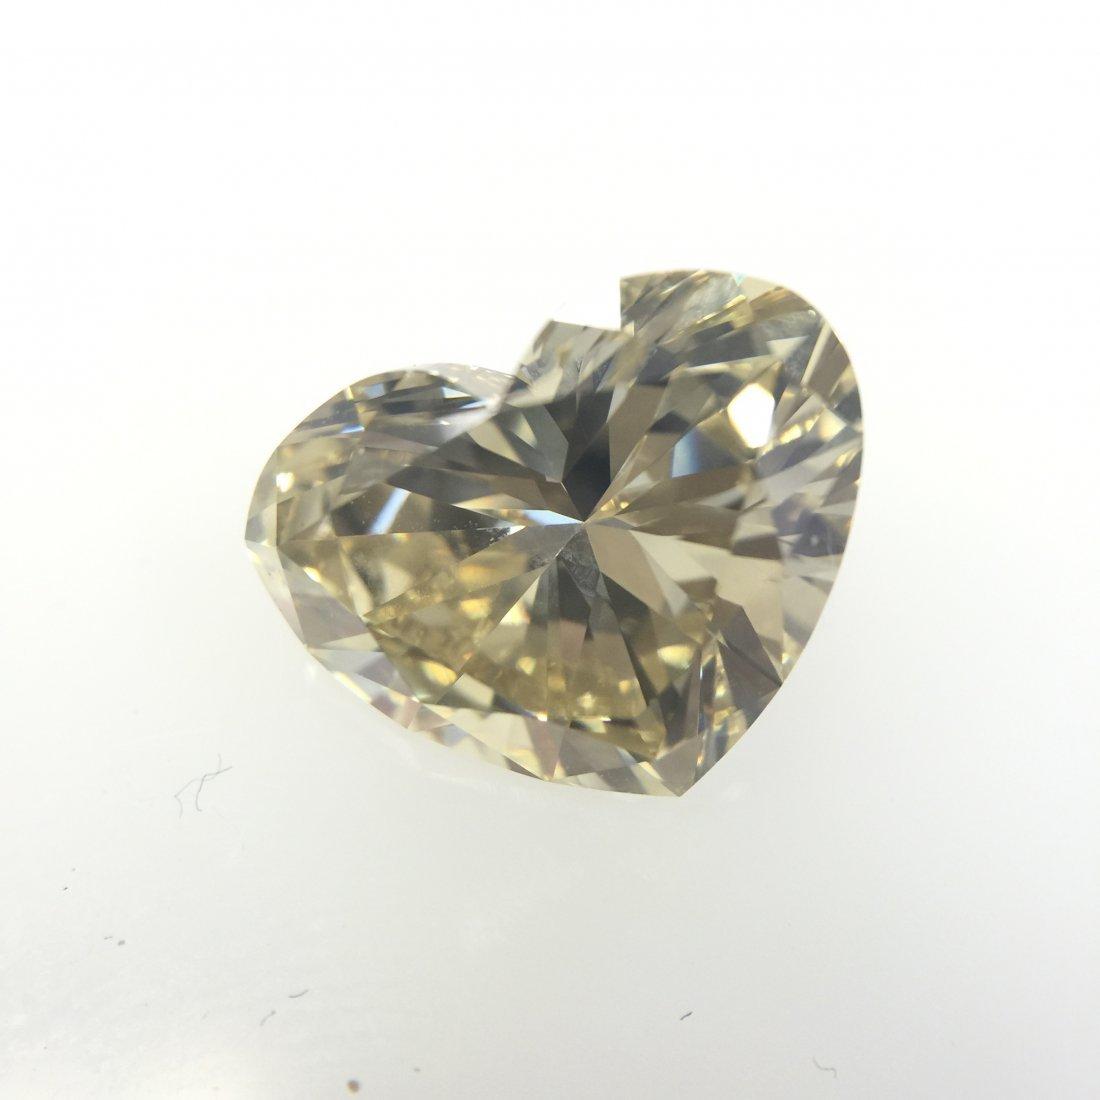 3.55 CT Heart VS1 Yellow Fancy Loose Diamond! GIA